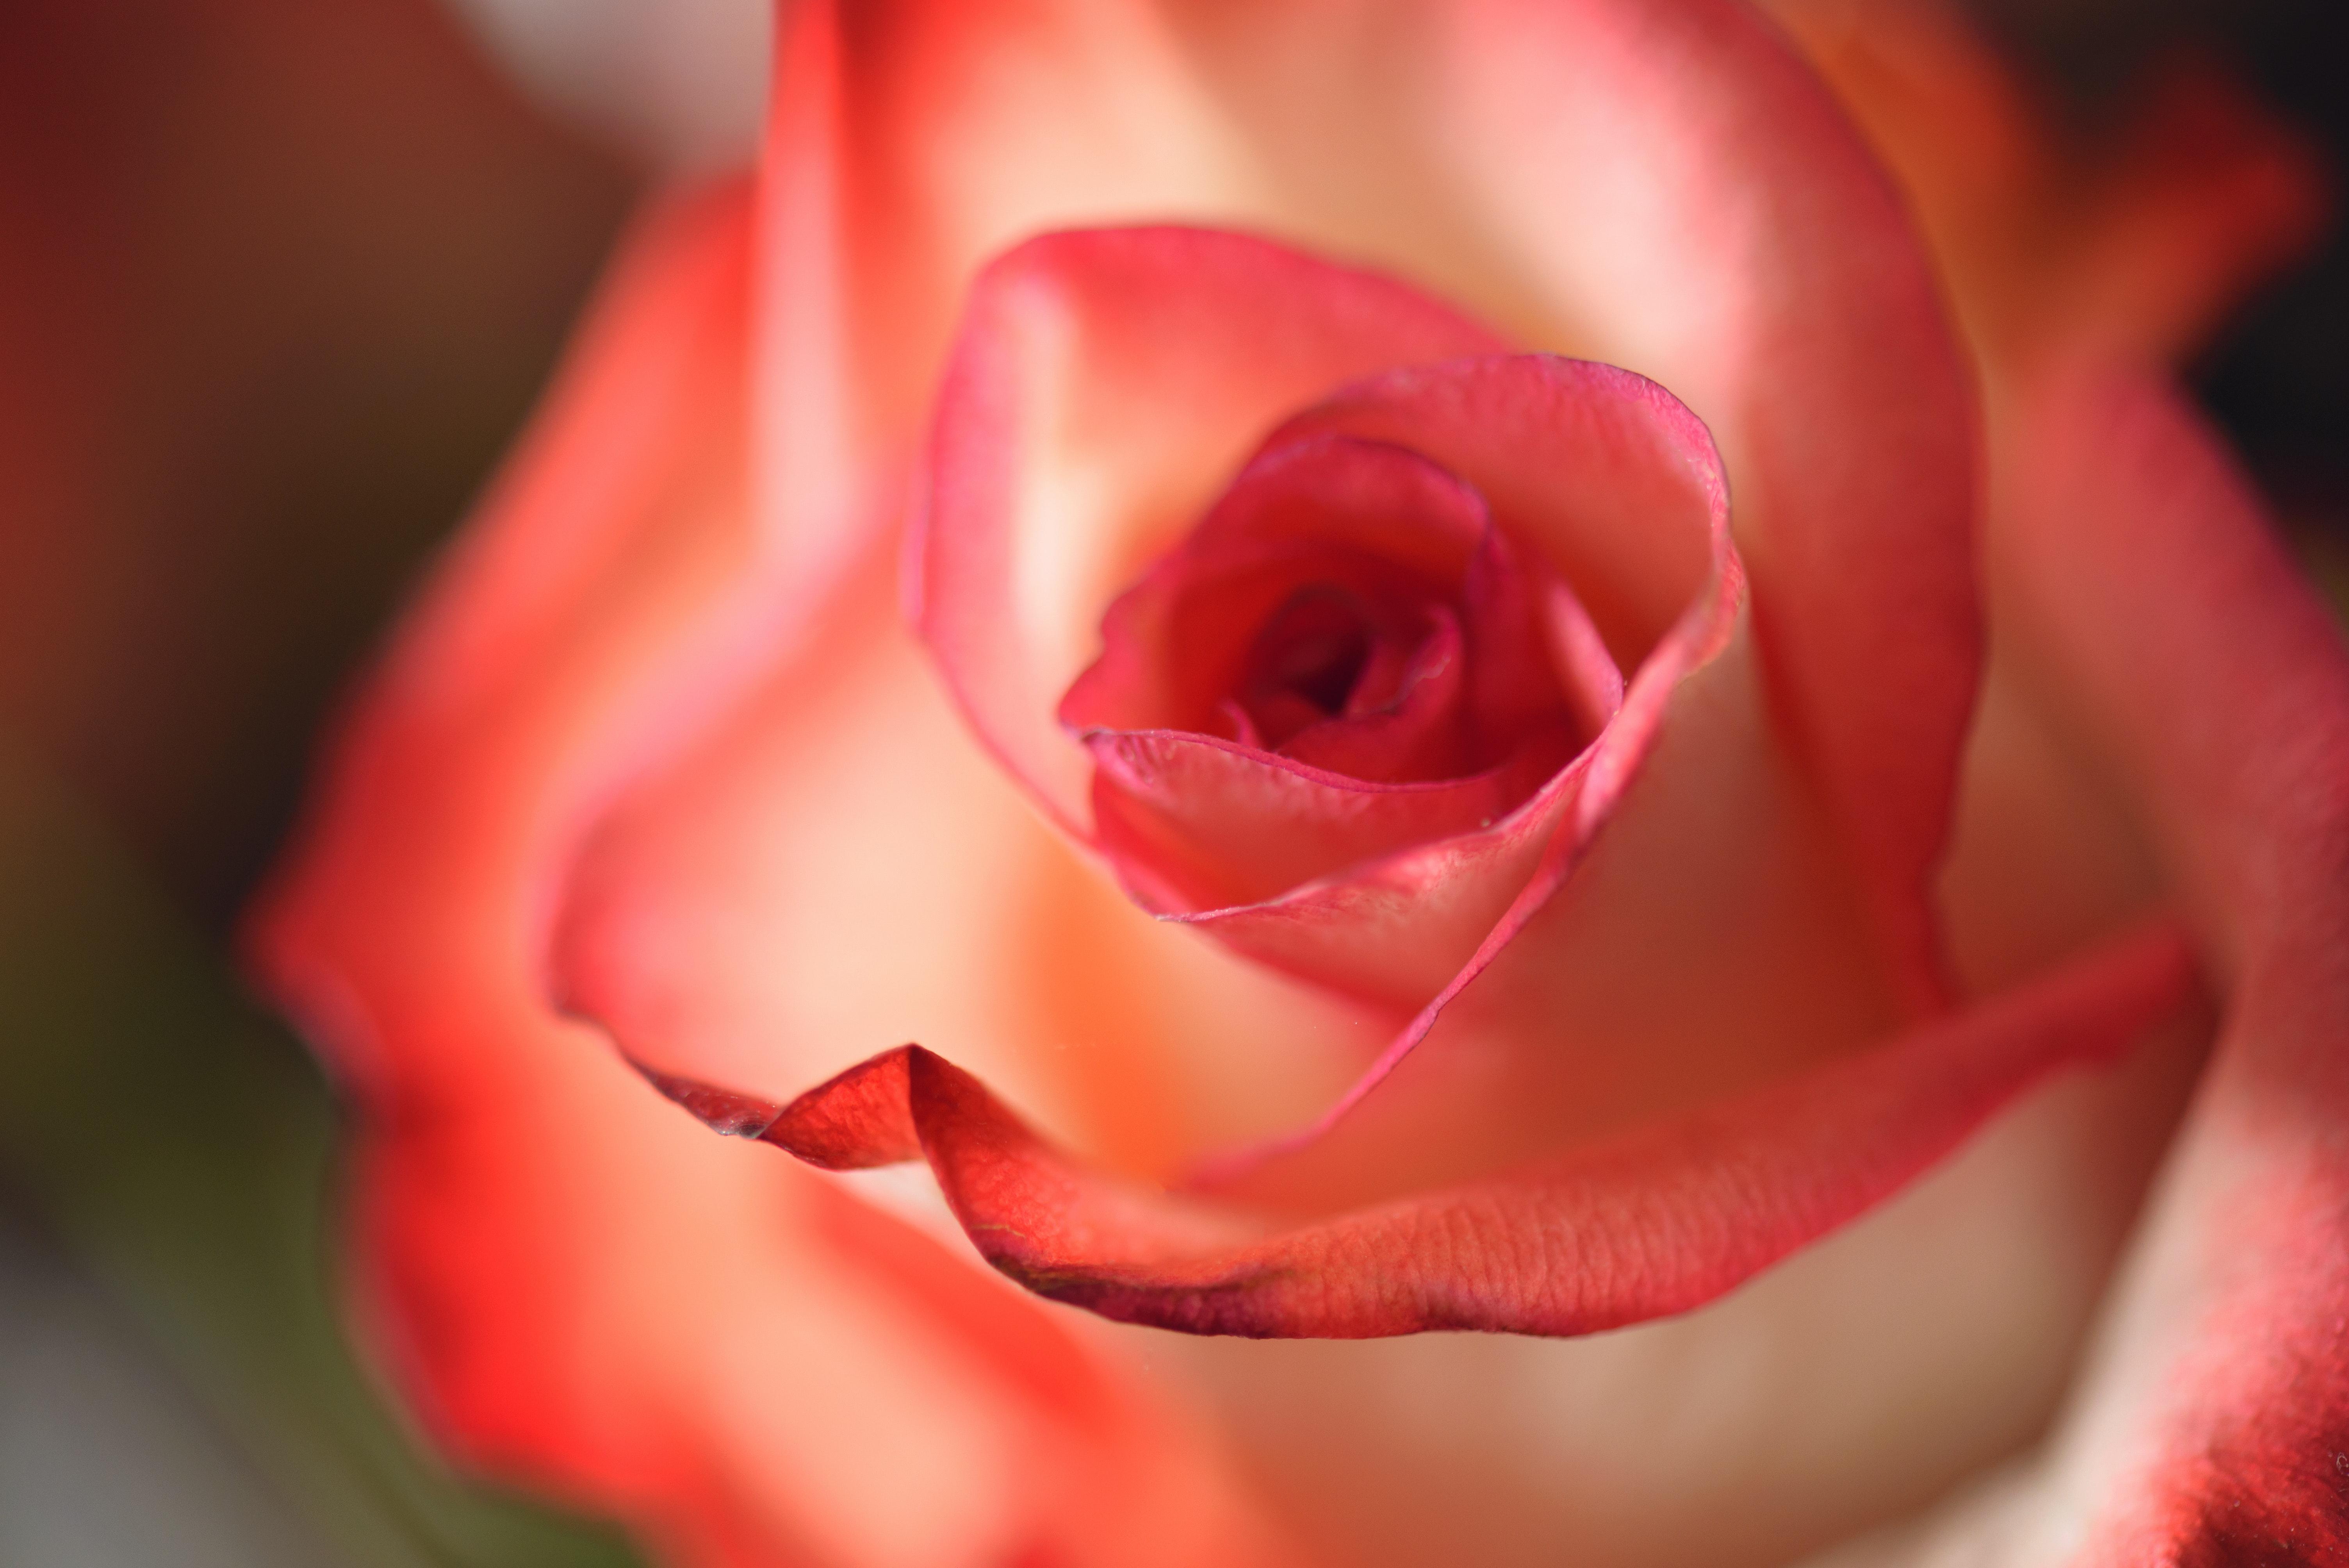 affection-anniversary-beautiful-633813